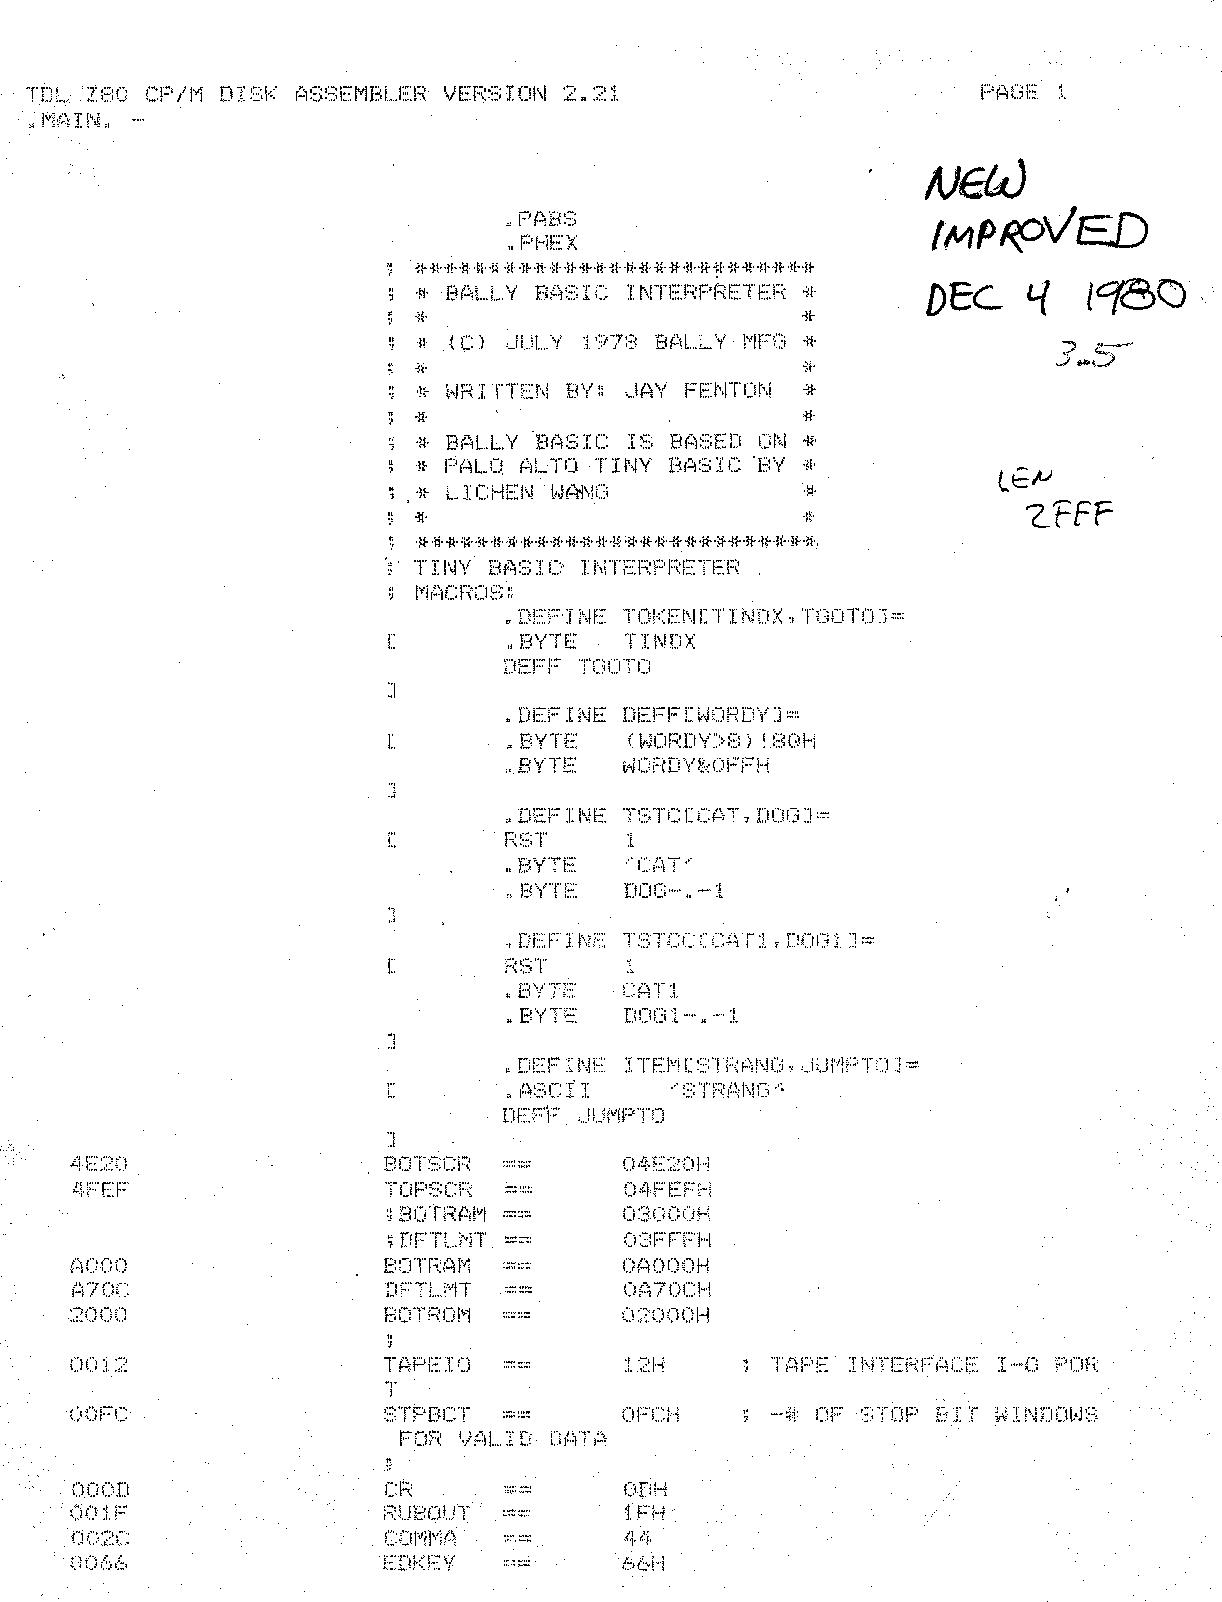 Bally_BASIC_3 5_19801204 Bally BASIC 3 5 19801204